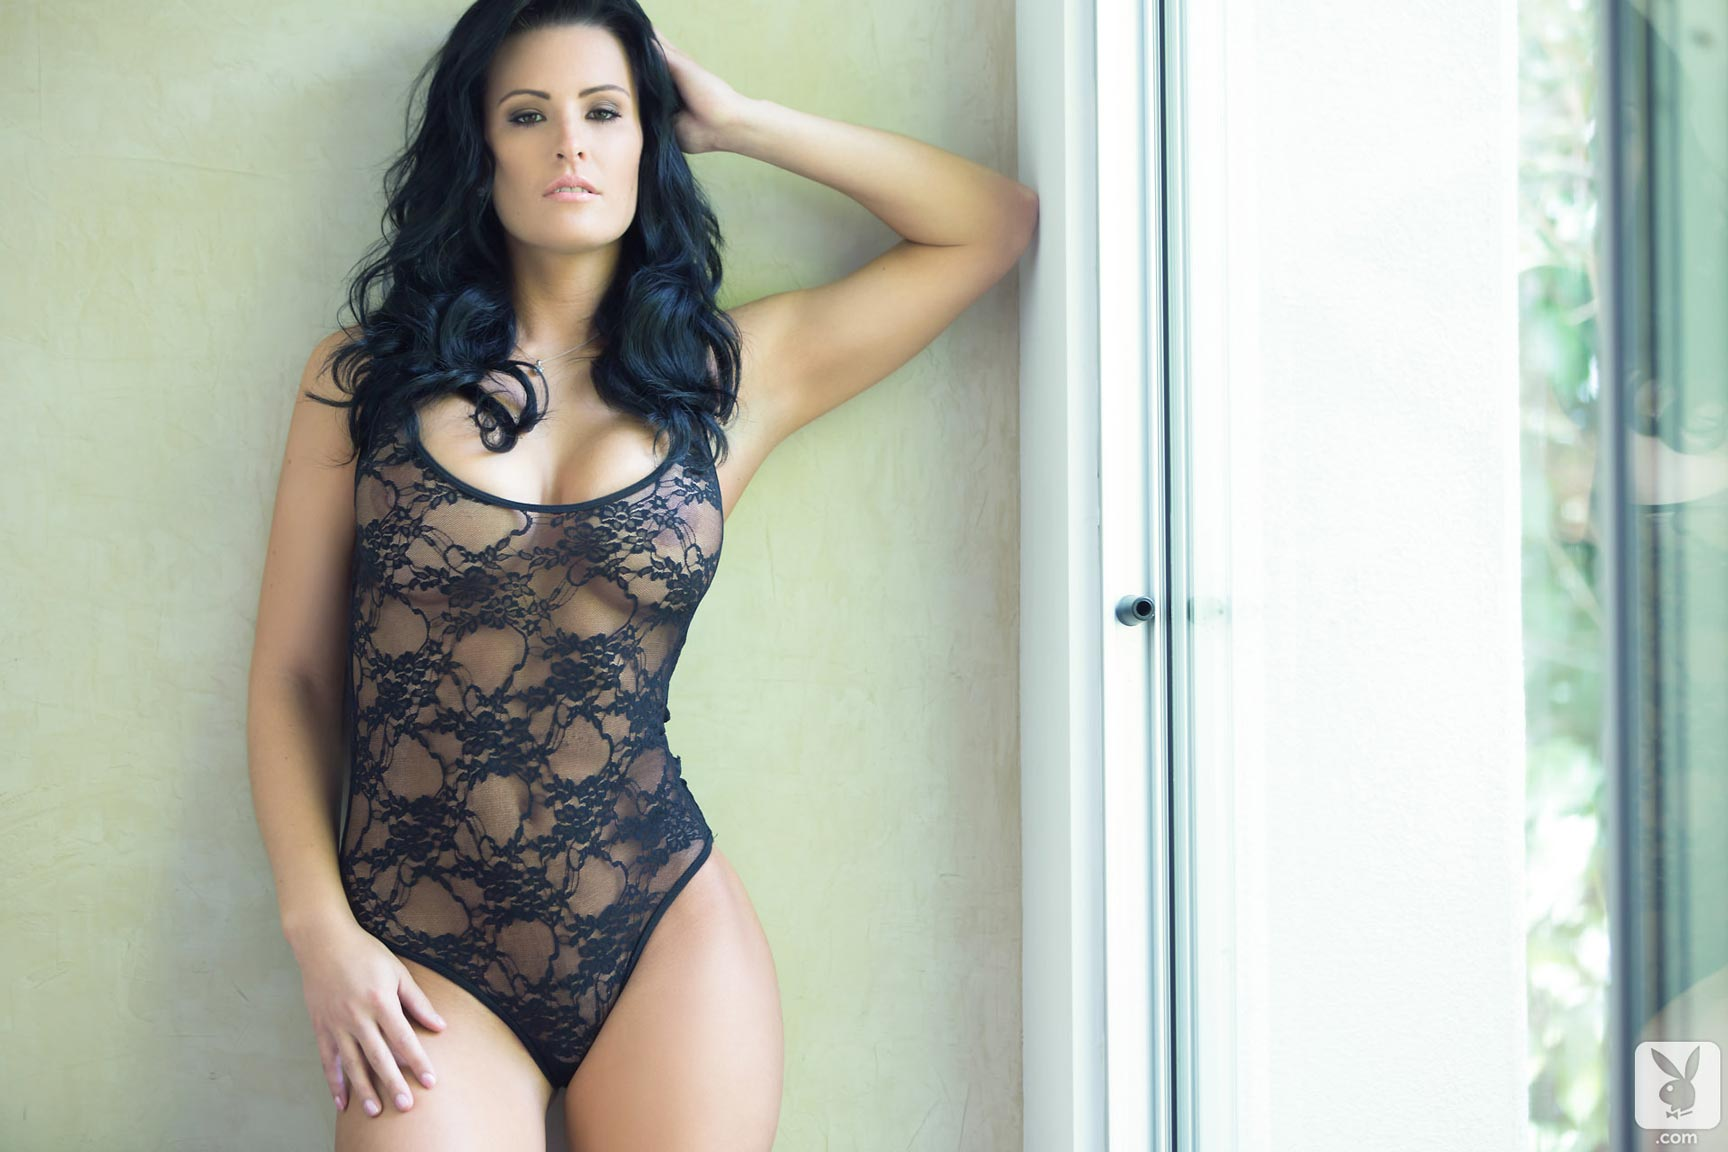 Jessie Shannon in lingerie